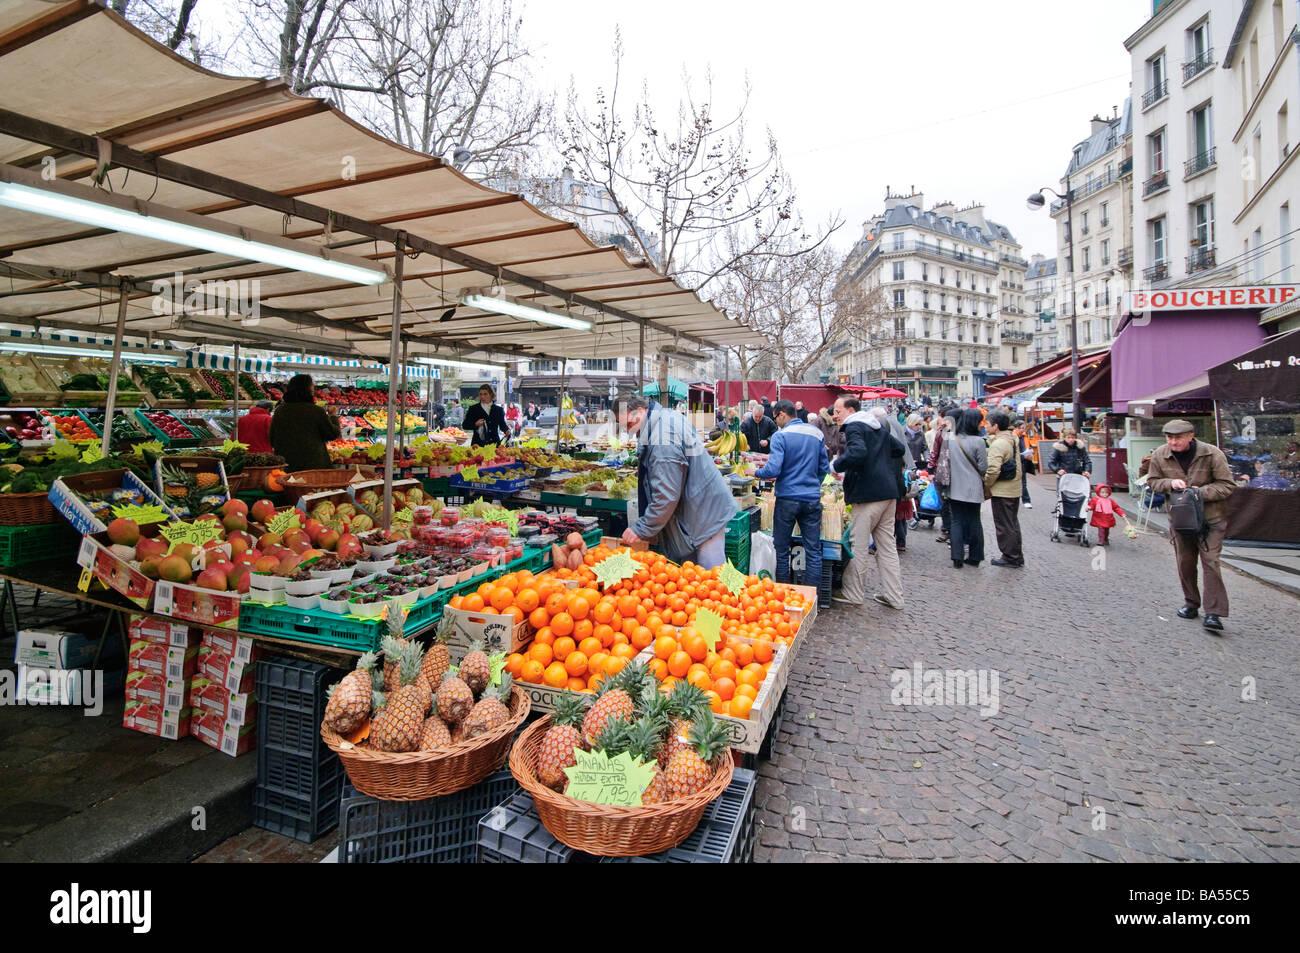 PARIS, France - Fresh produce market on Mouffetard. - Stock Image